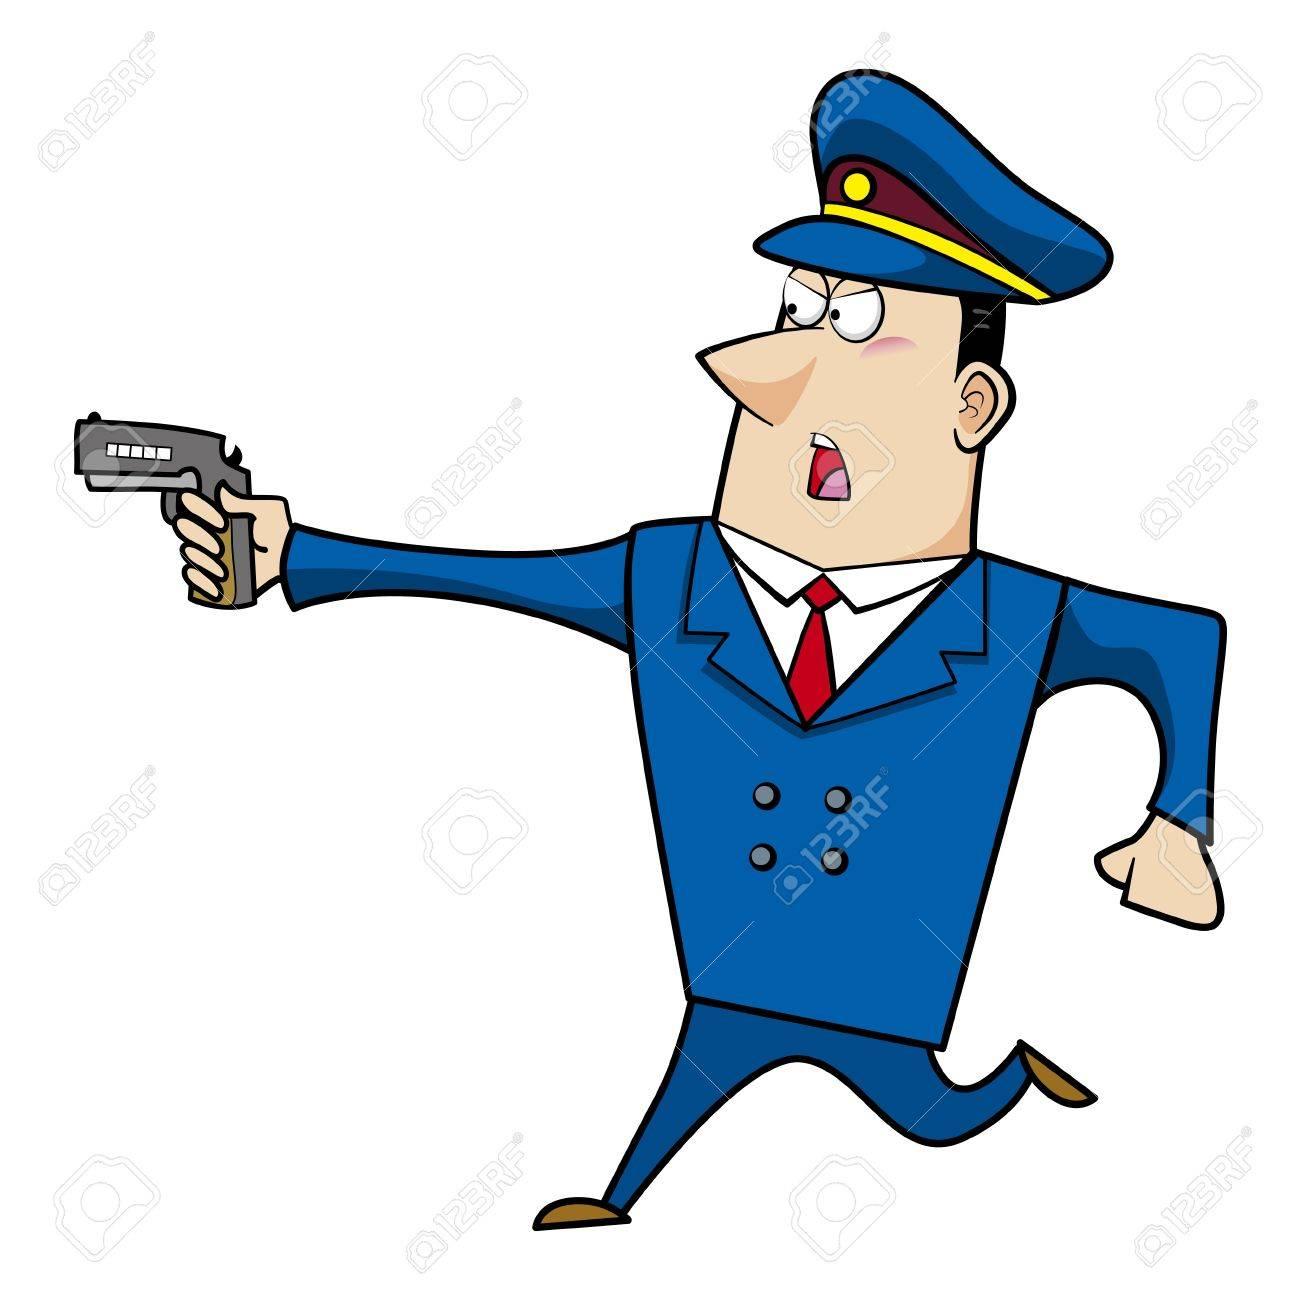 male cartoon police officer running with a gun.